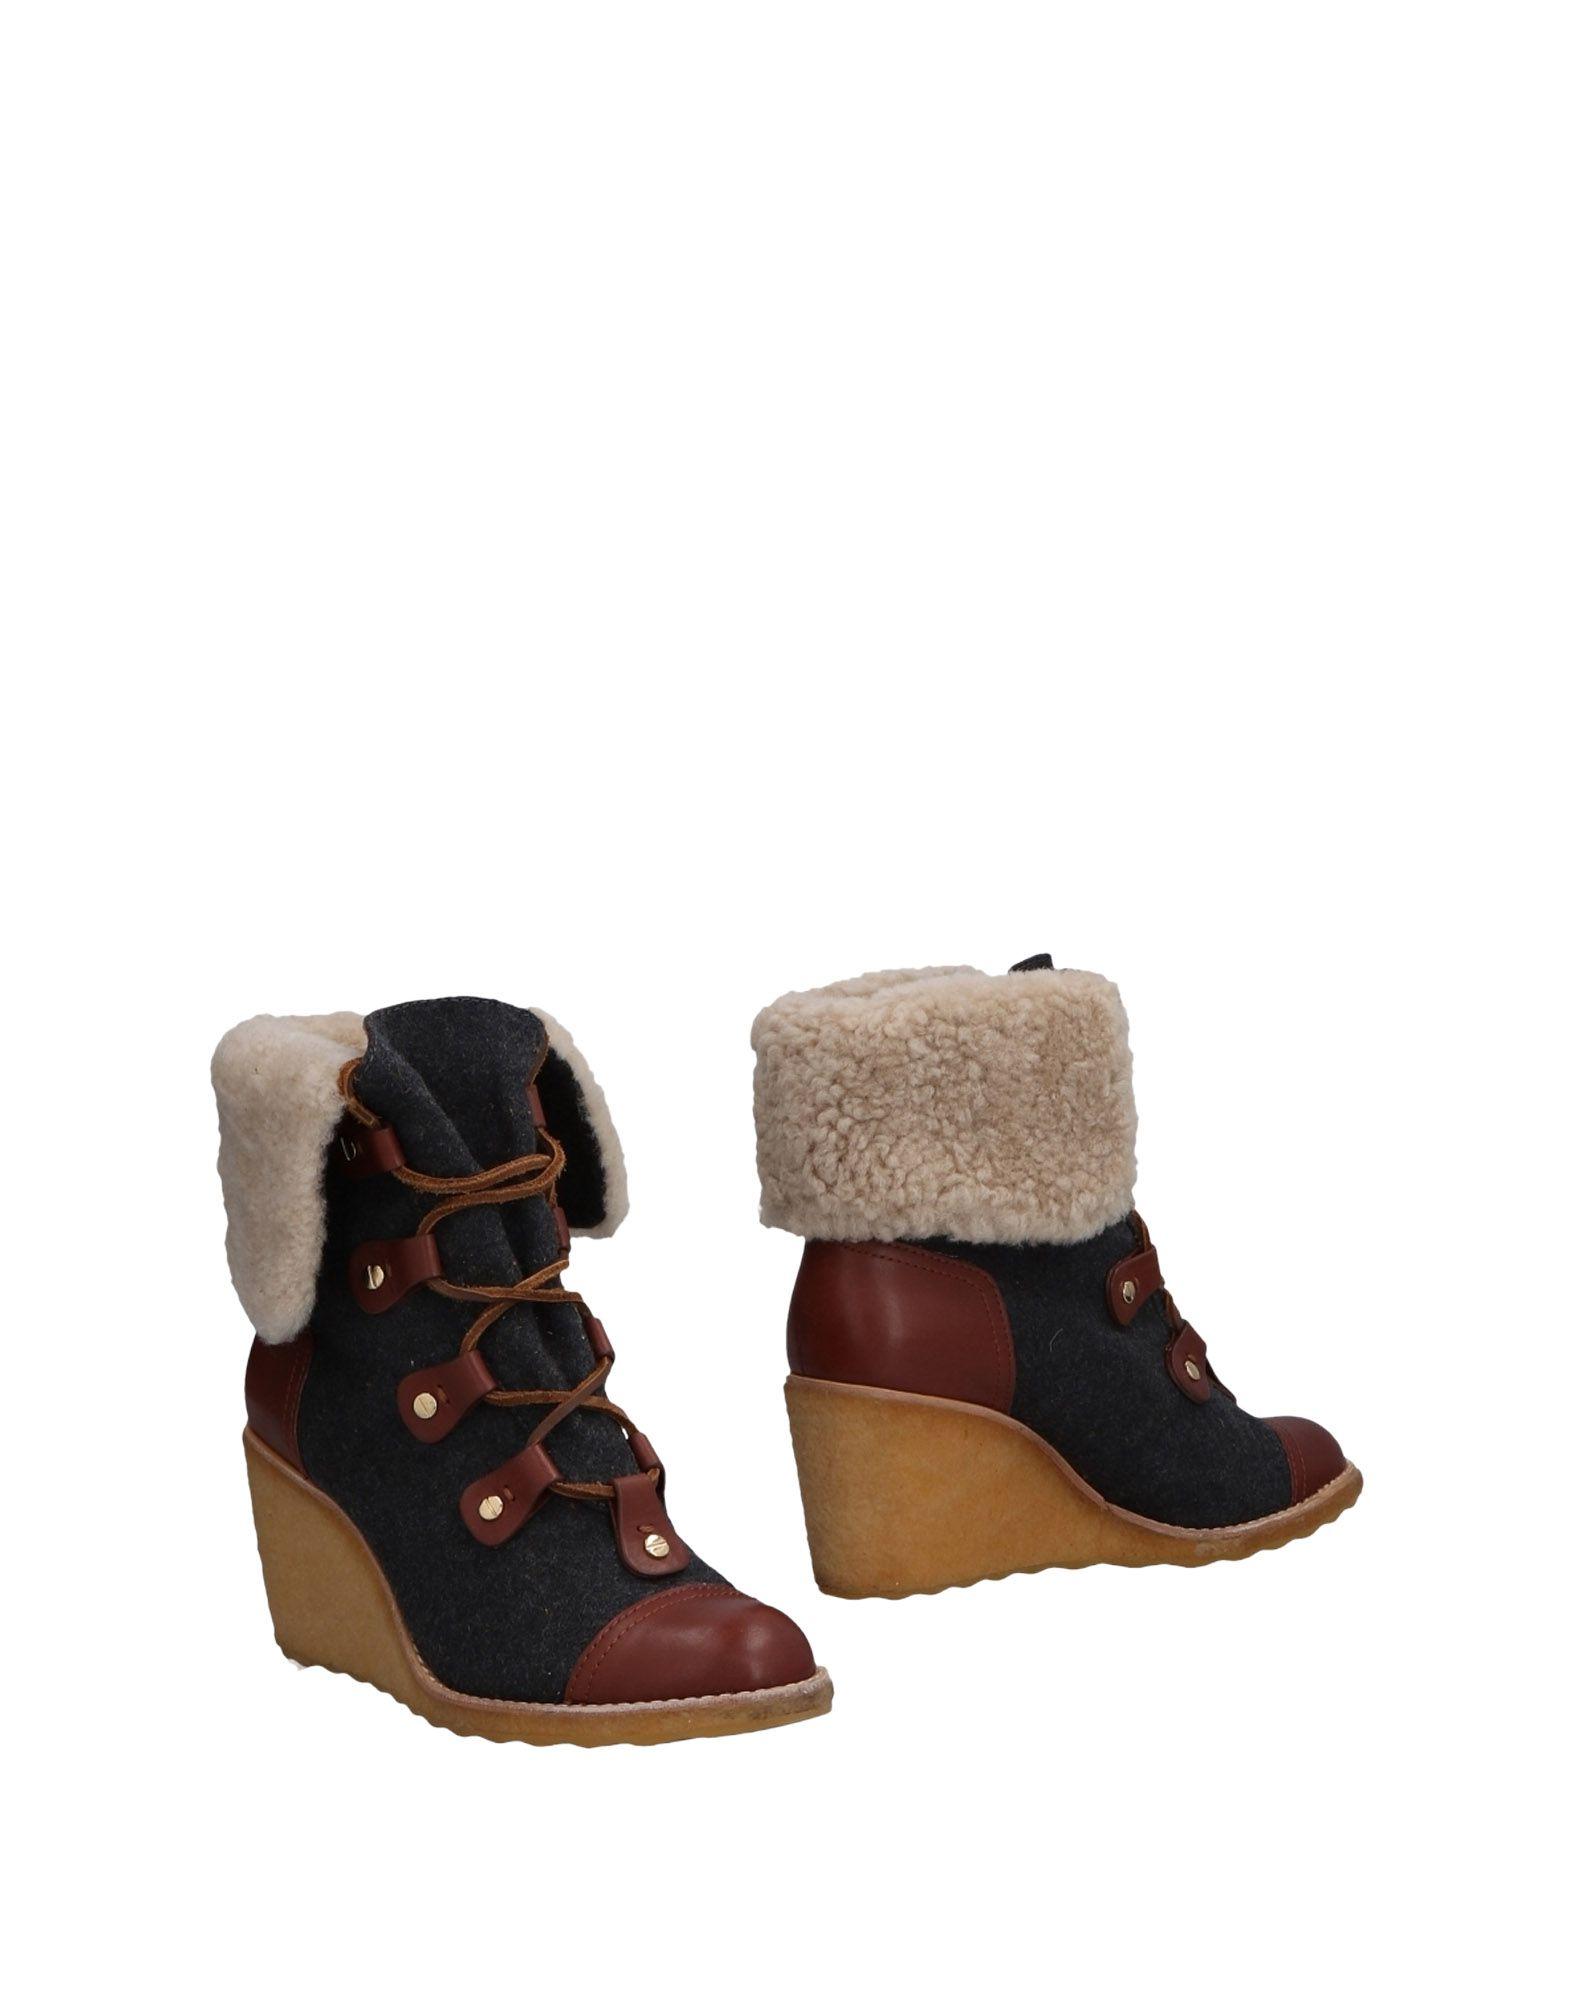 Rabatt Damen Schuhe Tory Burch Stiefelette Damen Rabatt  11475542FH eb6af5